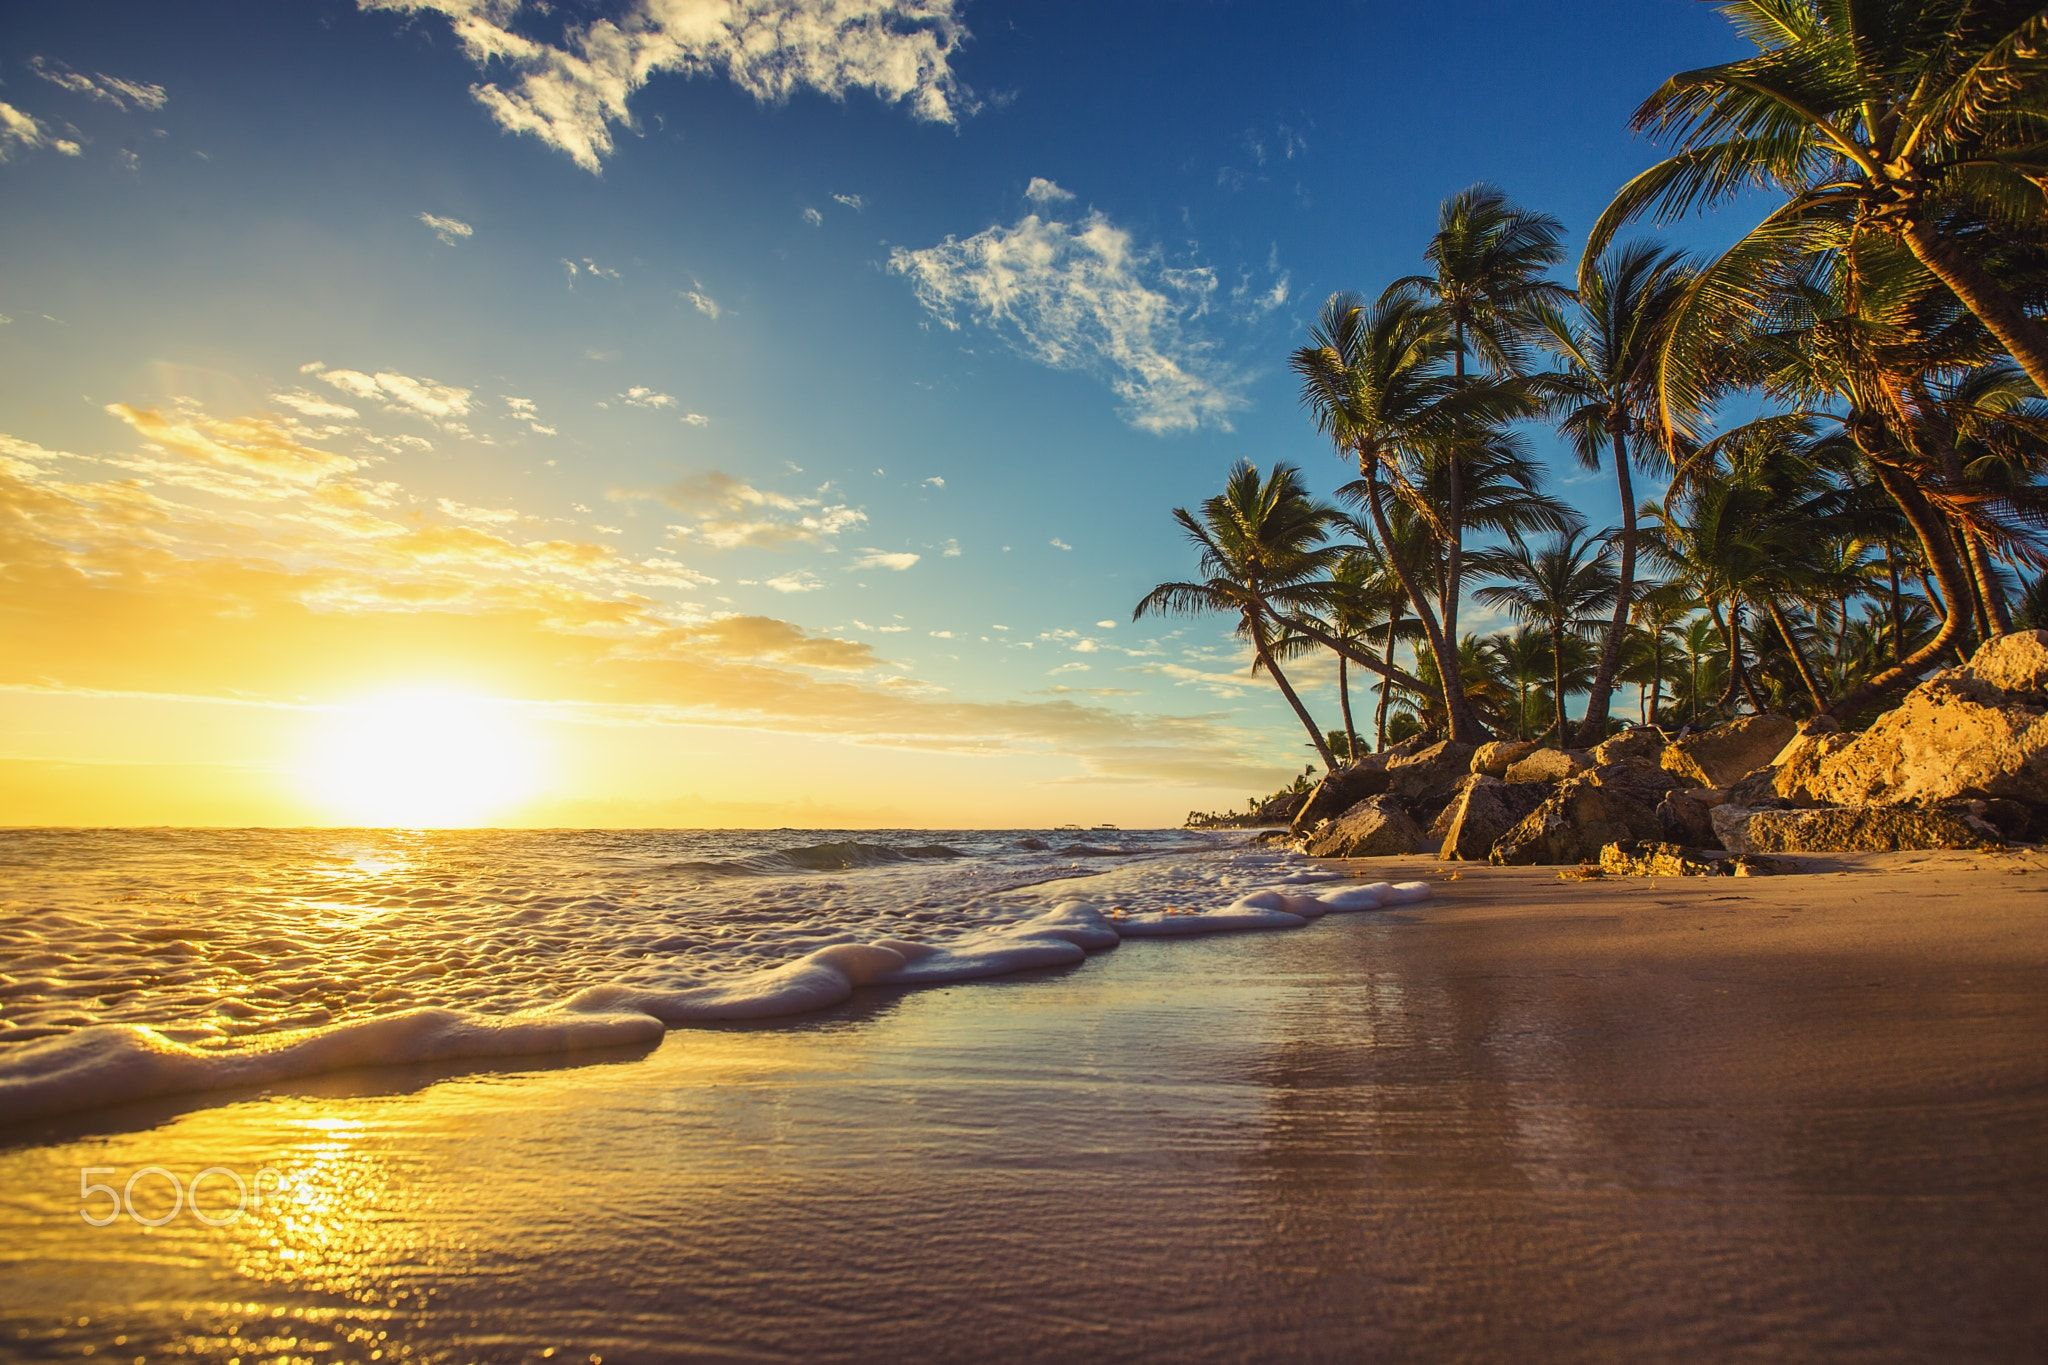 Landscape Of Paradise Tropical Island Beach Sunrise Shot Palm Trees On The Tropical Beach Dominican Republ Tropical Island Beach Sunrise Beach Island Beach Palm tree tropica island sea sand